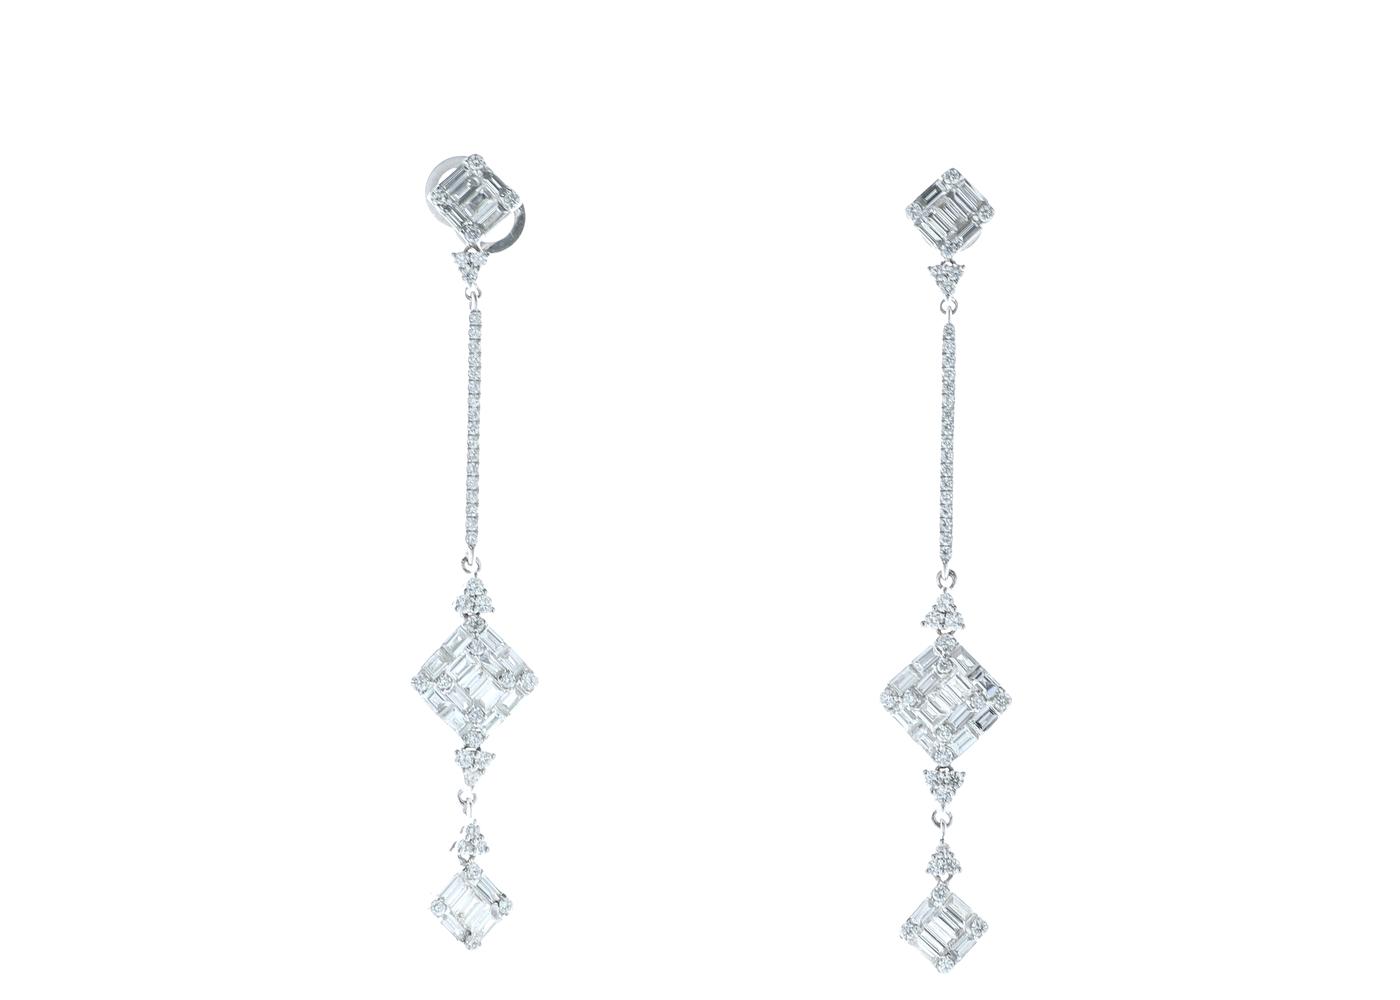 18ct White Gold Diamond Drop Earrings 2.29 Carats